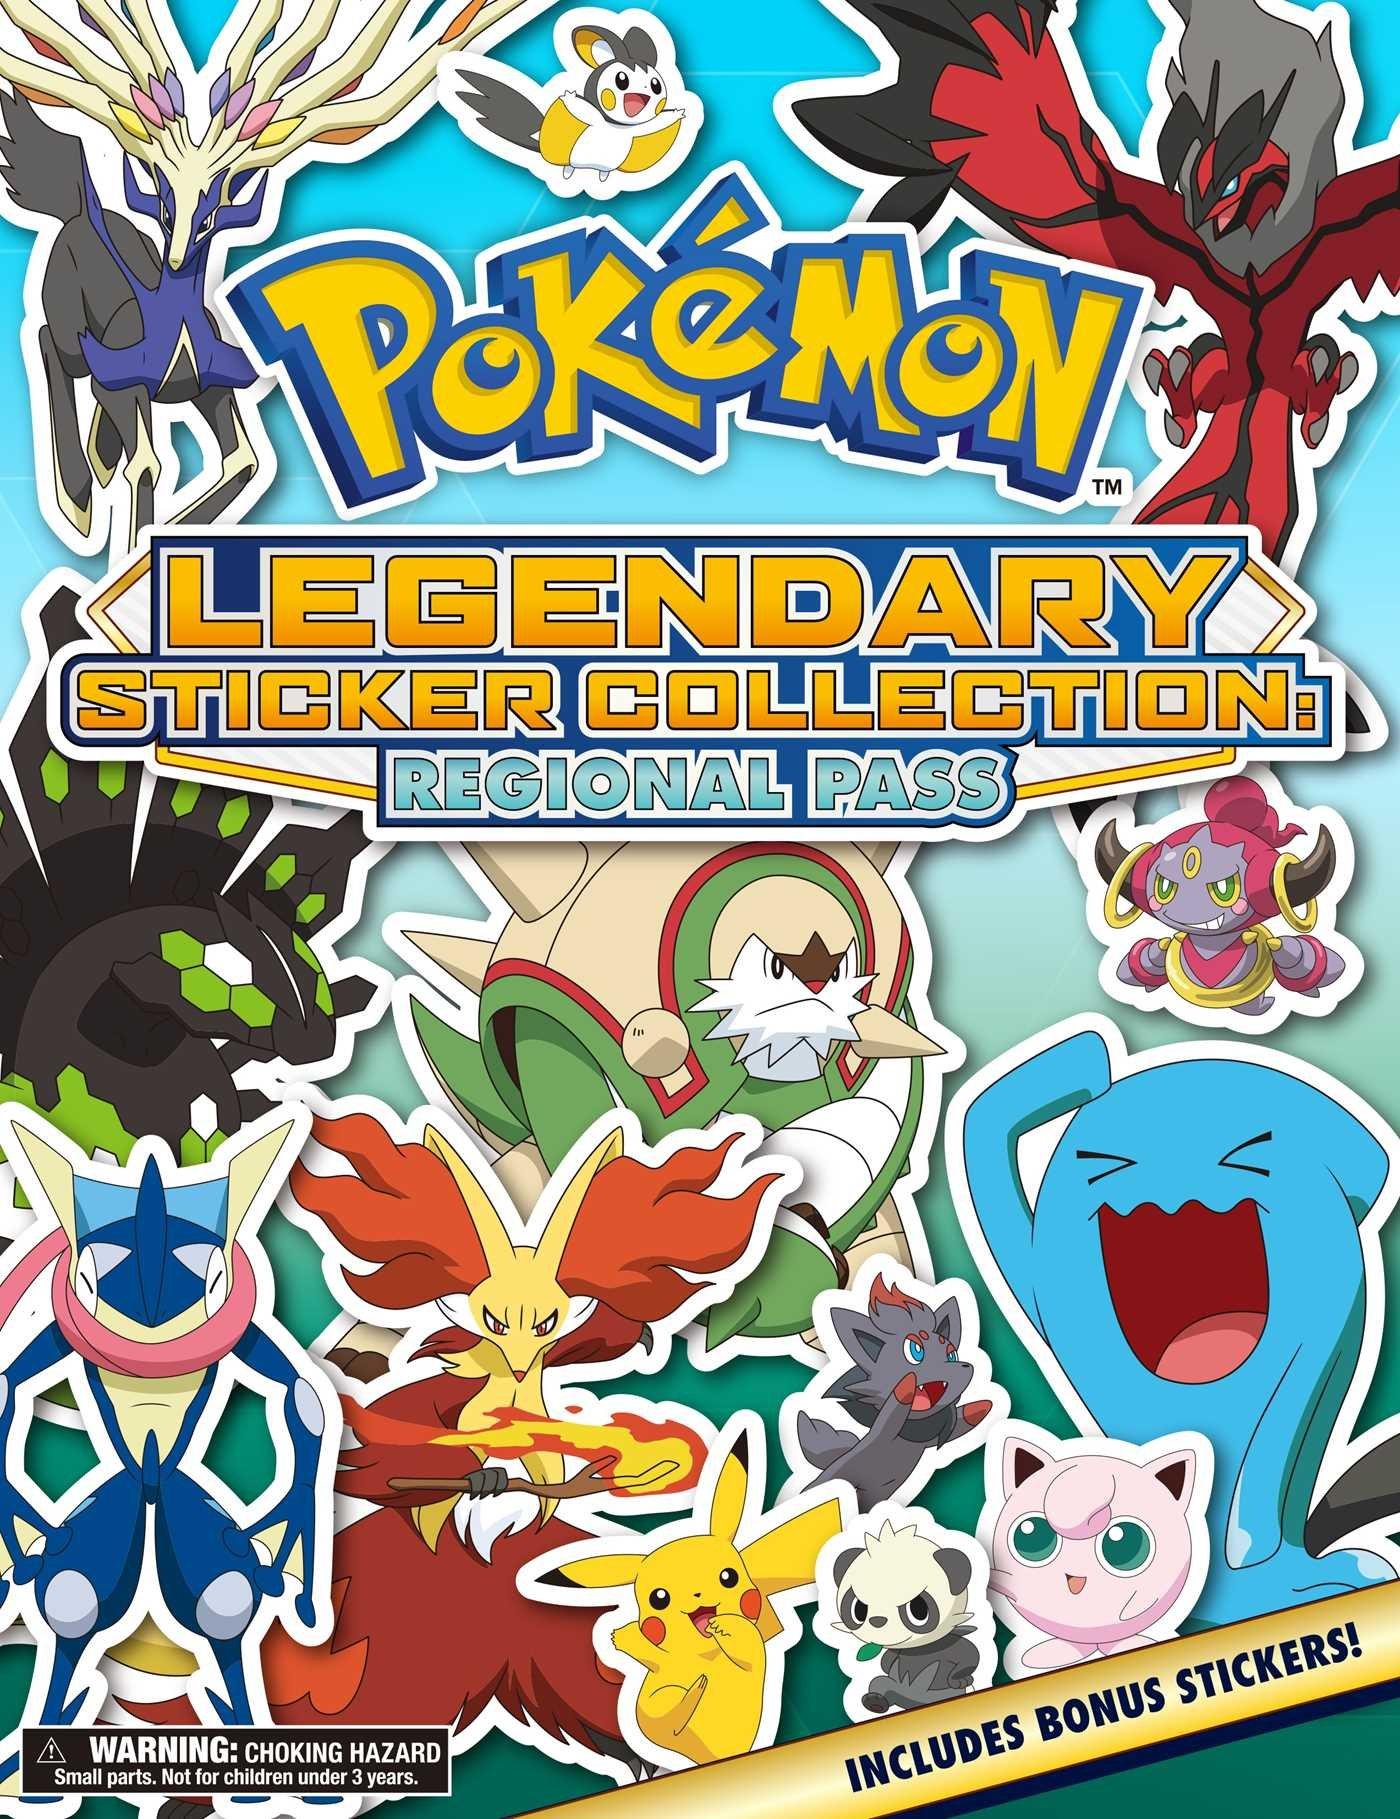 Pokemon Art Book Legendary Sticker Collection Regional